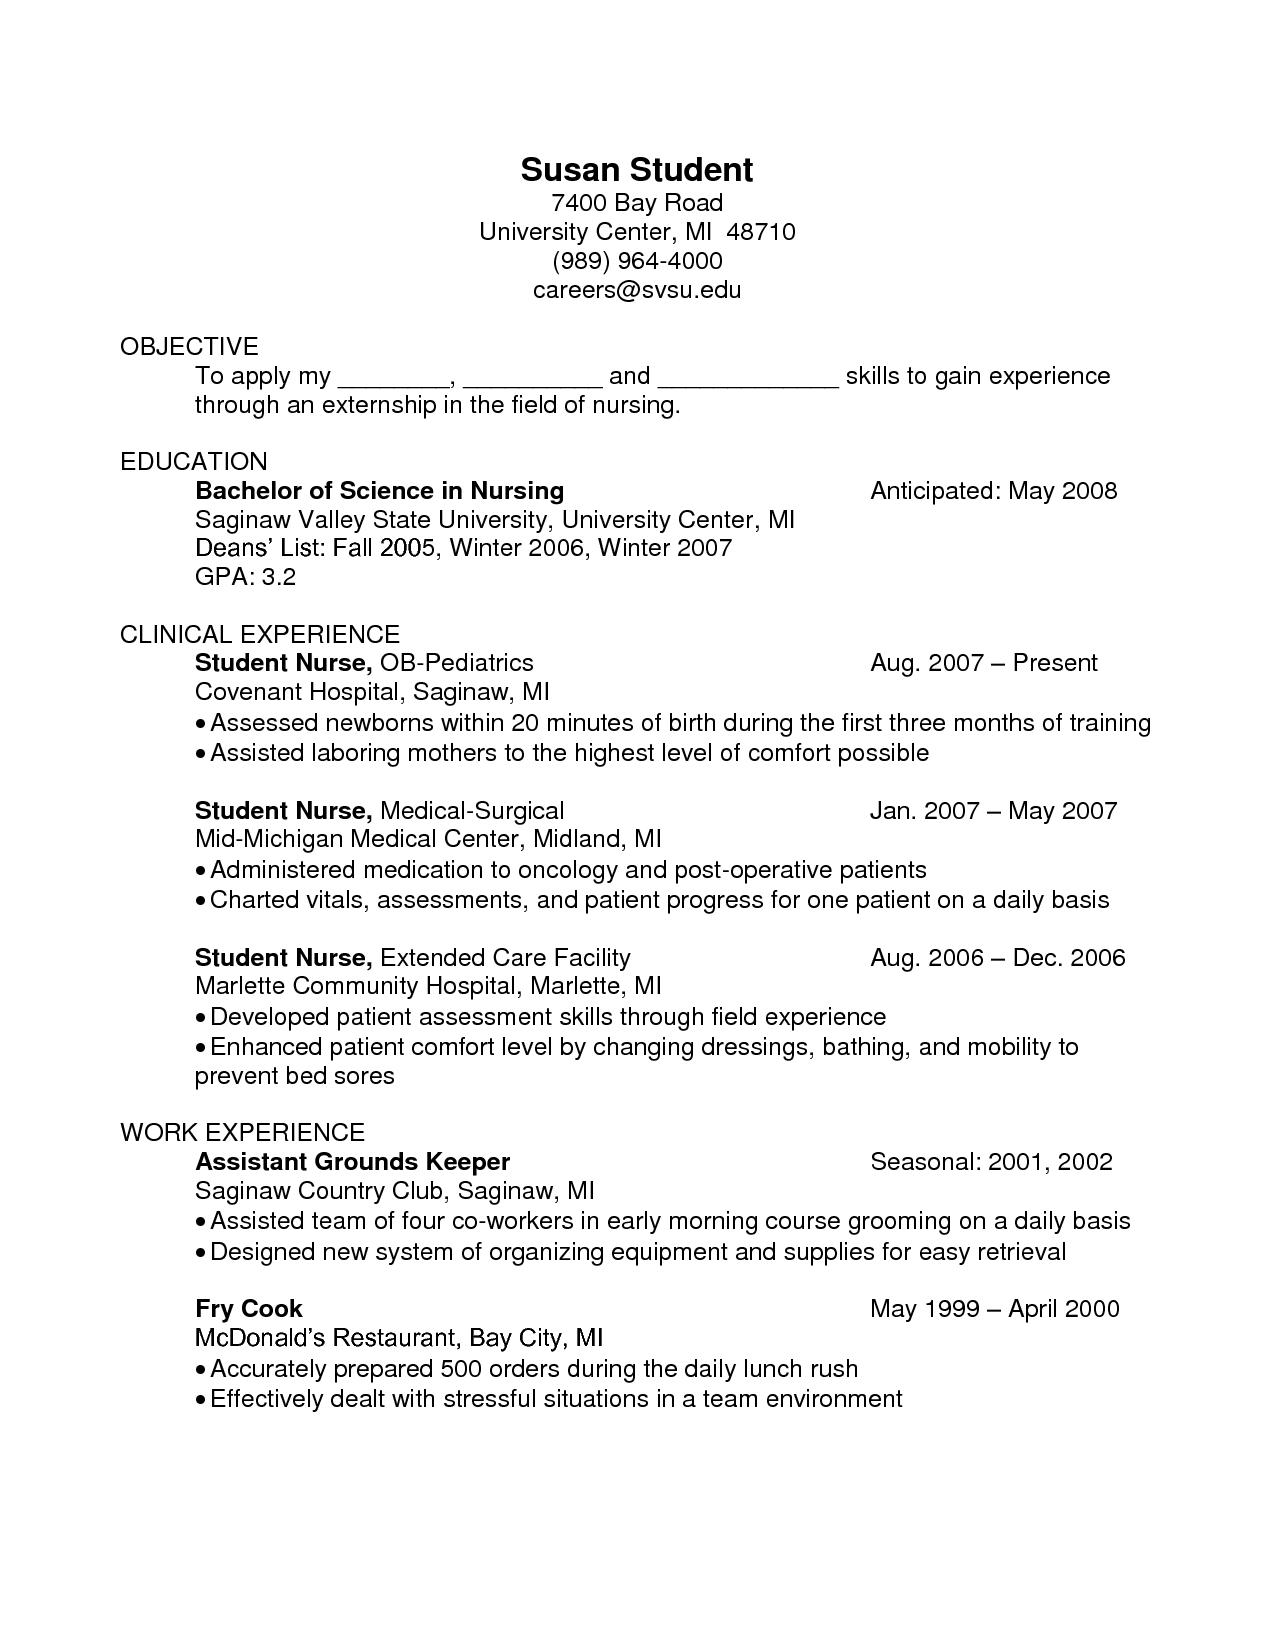 Oncology Nurse Resume Examplecareer Resume Template Career Resume Template